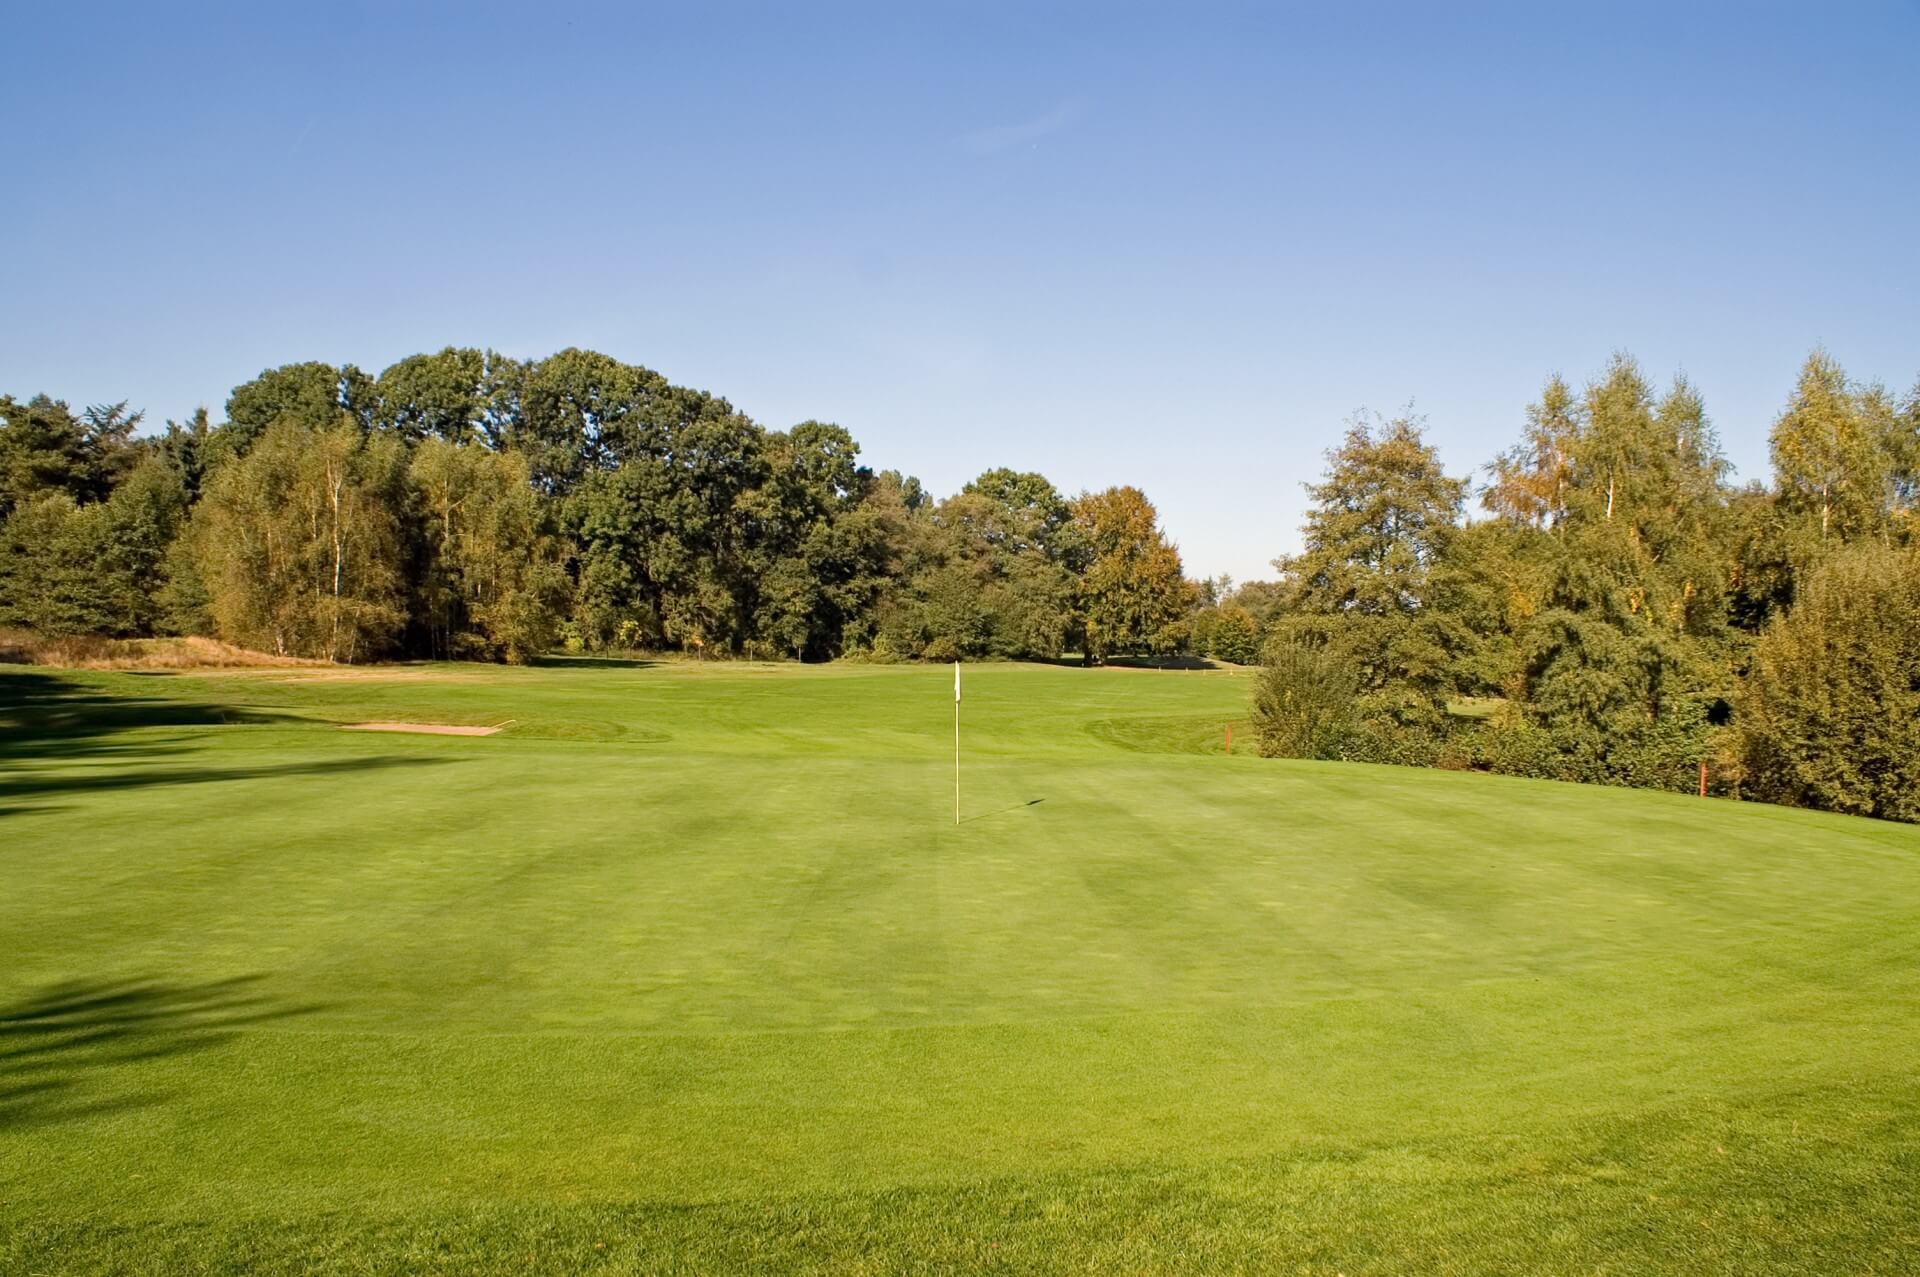 https://golfclub-peckeloh.de/wp-content/uploads/2021/04/PICT0263.jpg